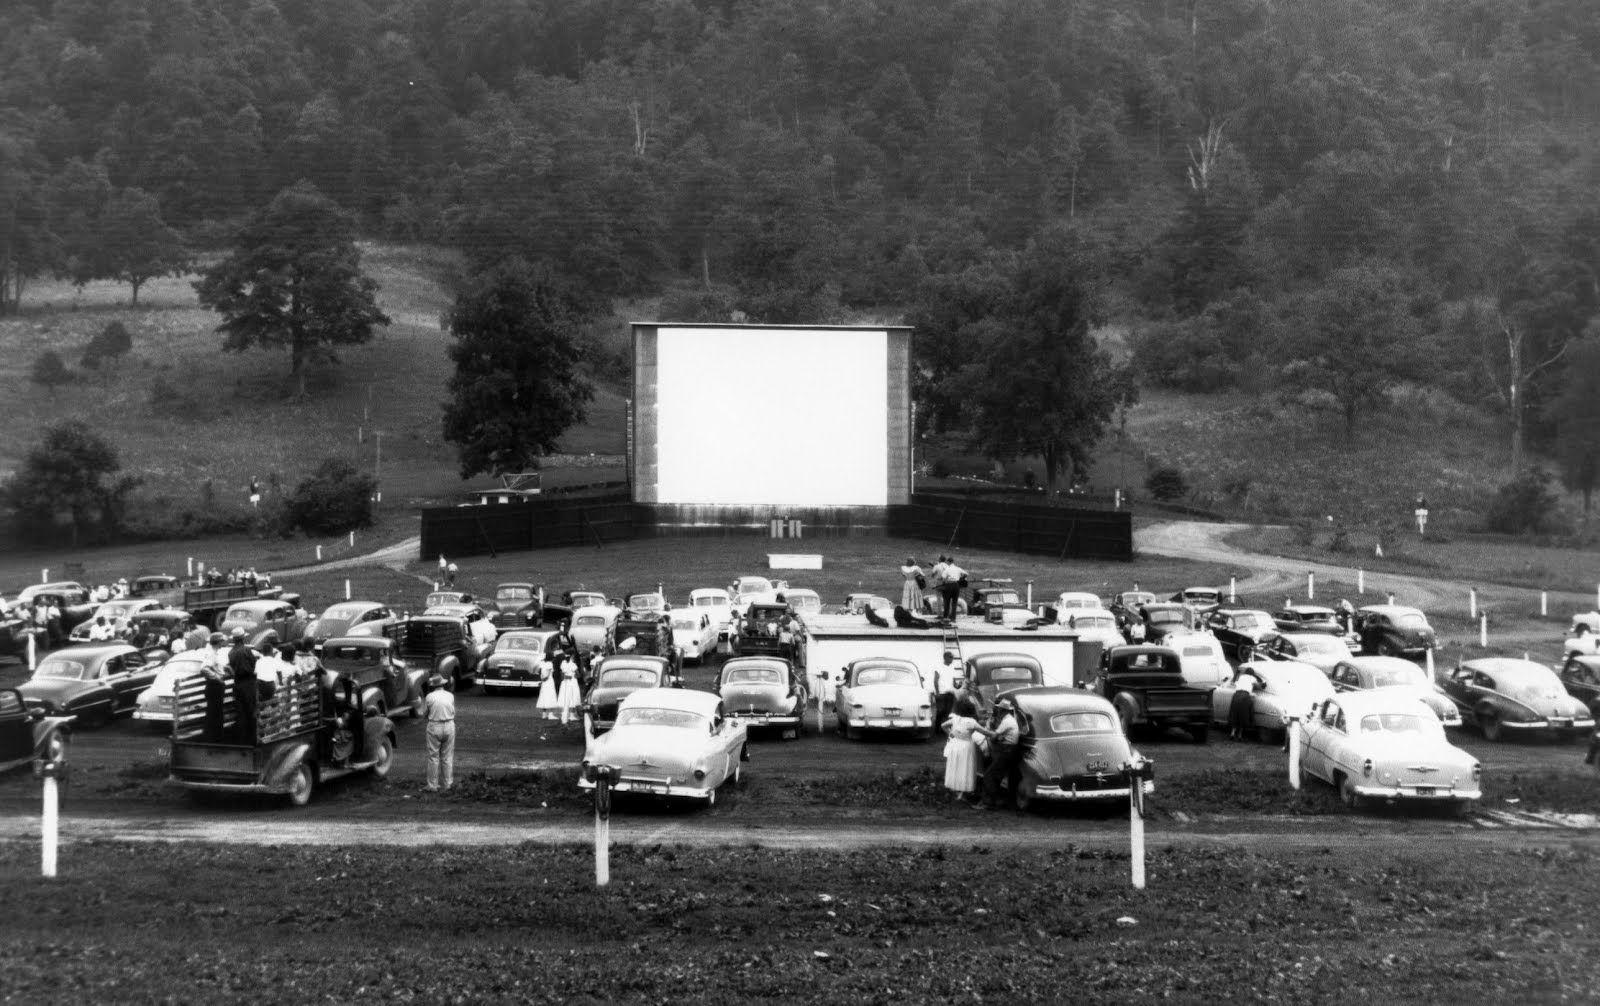 sioux city iowa movie theater showtimes